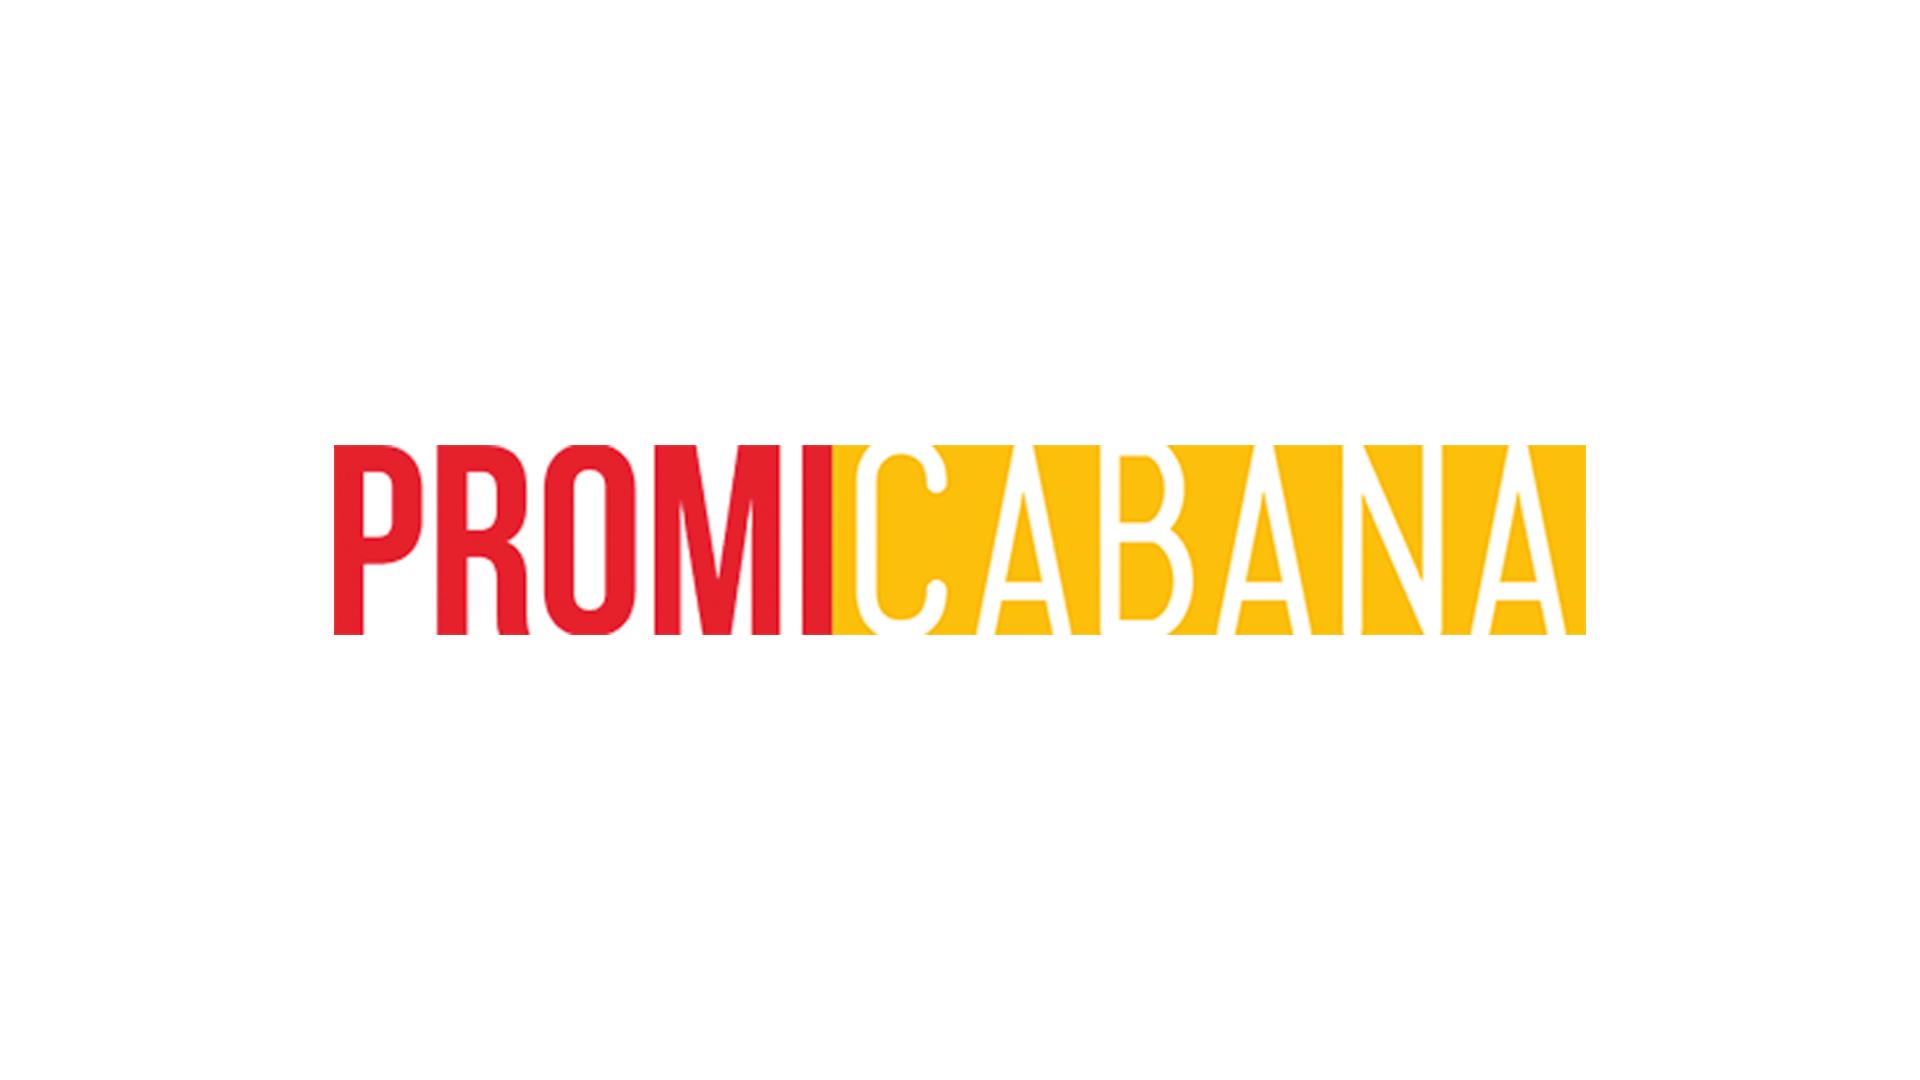 Taylor-Swift-Ed-Sheeran-Jingle-Ball-End-Game